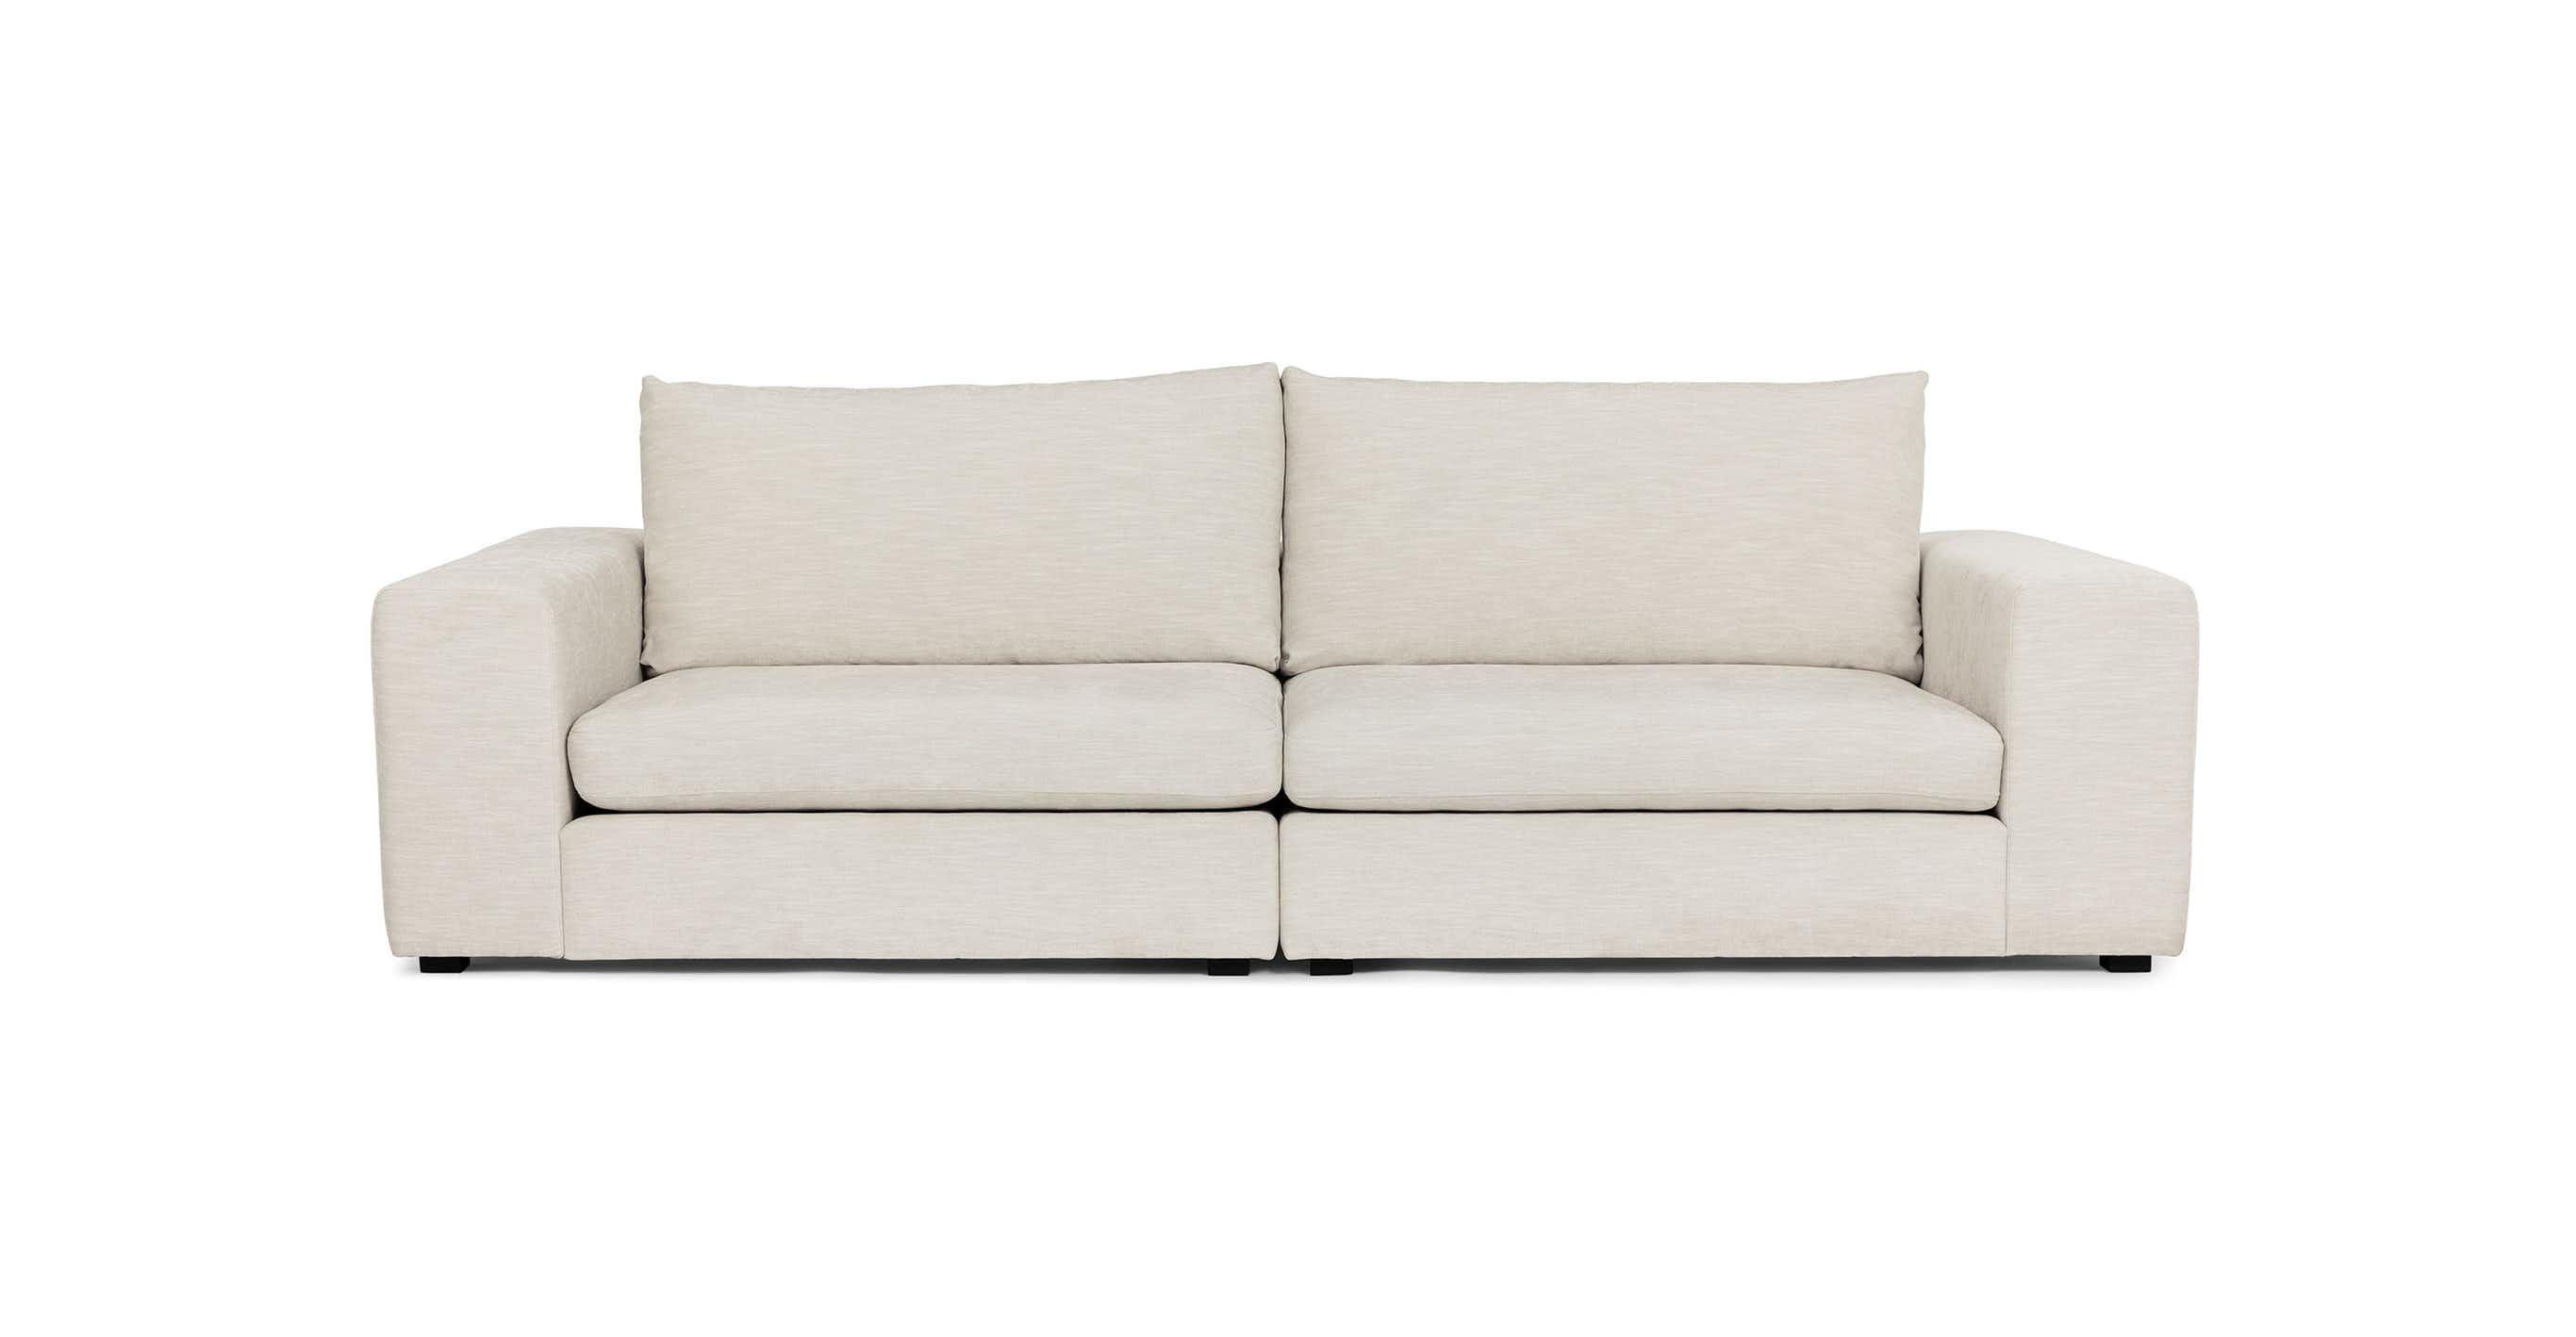 Gaba Pearl White Two Seater Modular Sofa Modular Sofa Mid